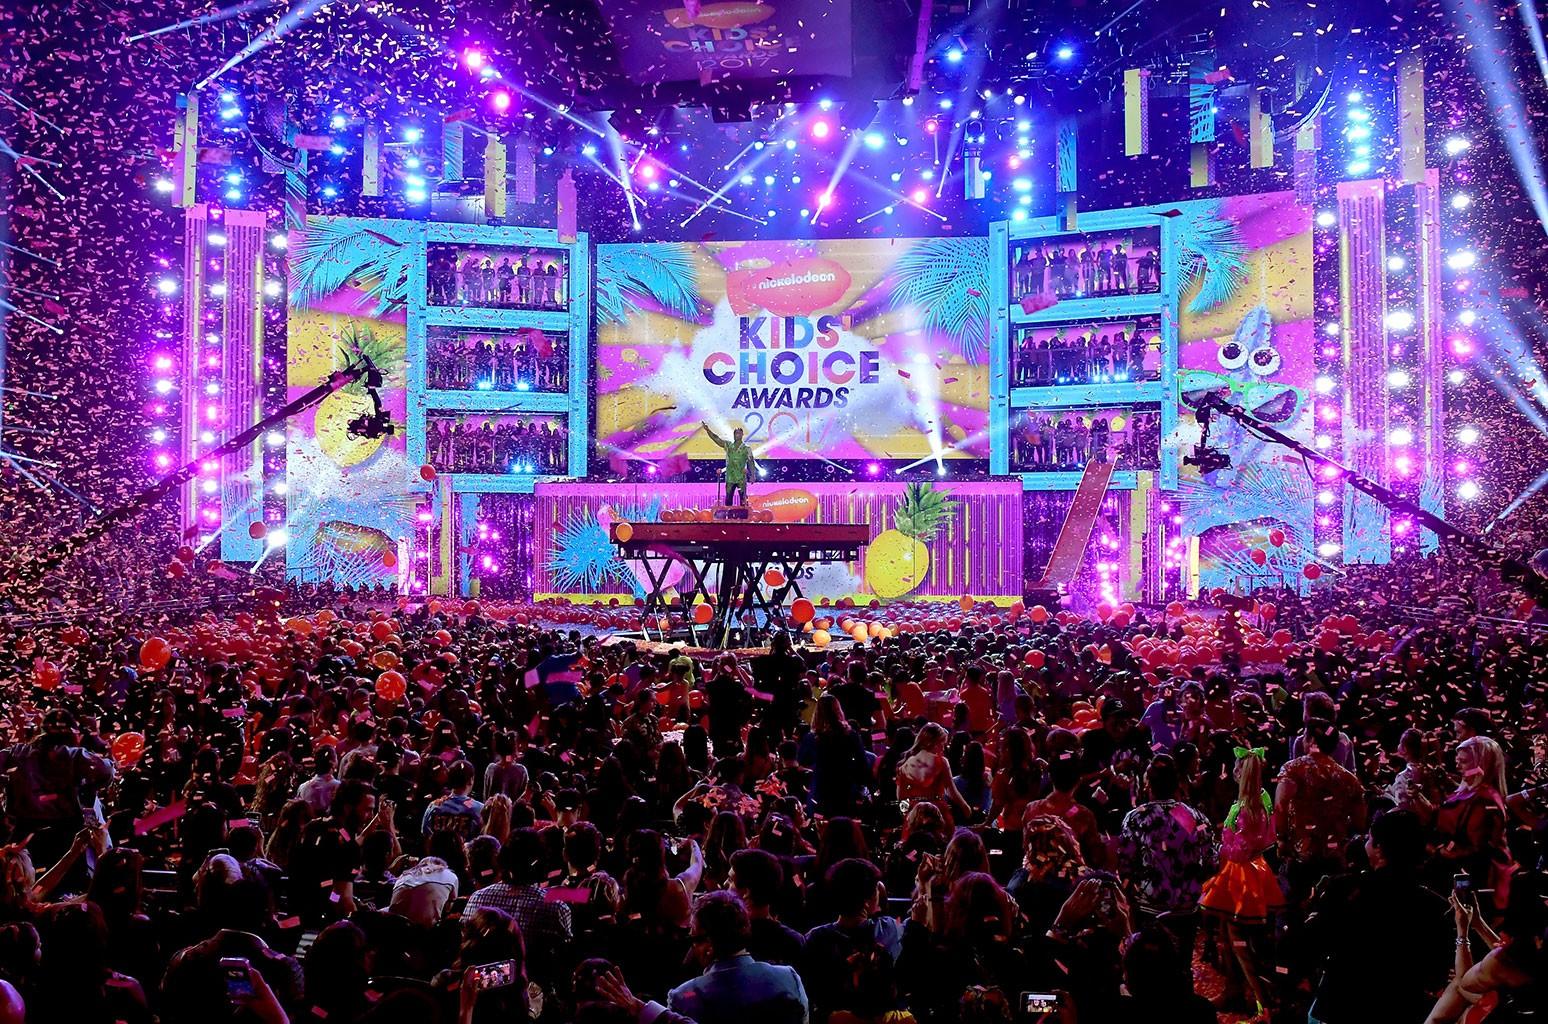 Nickelodeon's 2017 Kids' Choice Awards